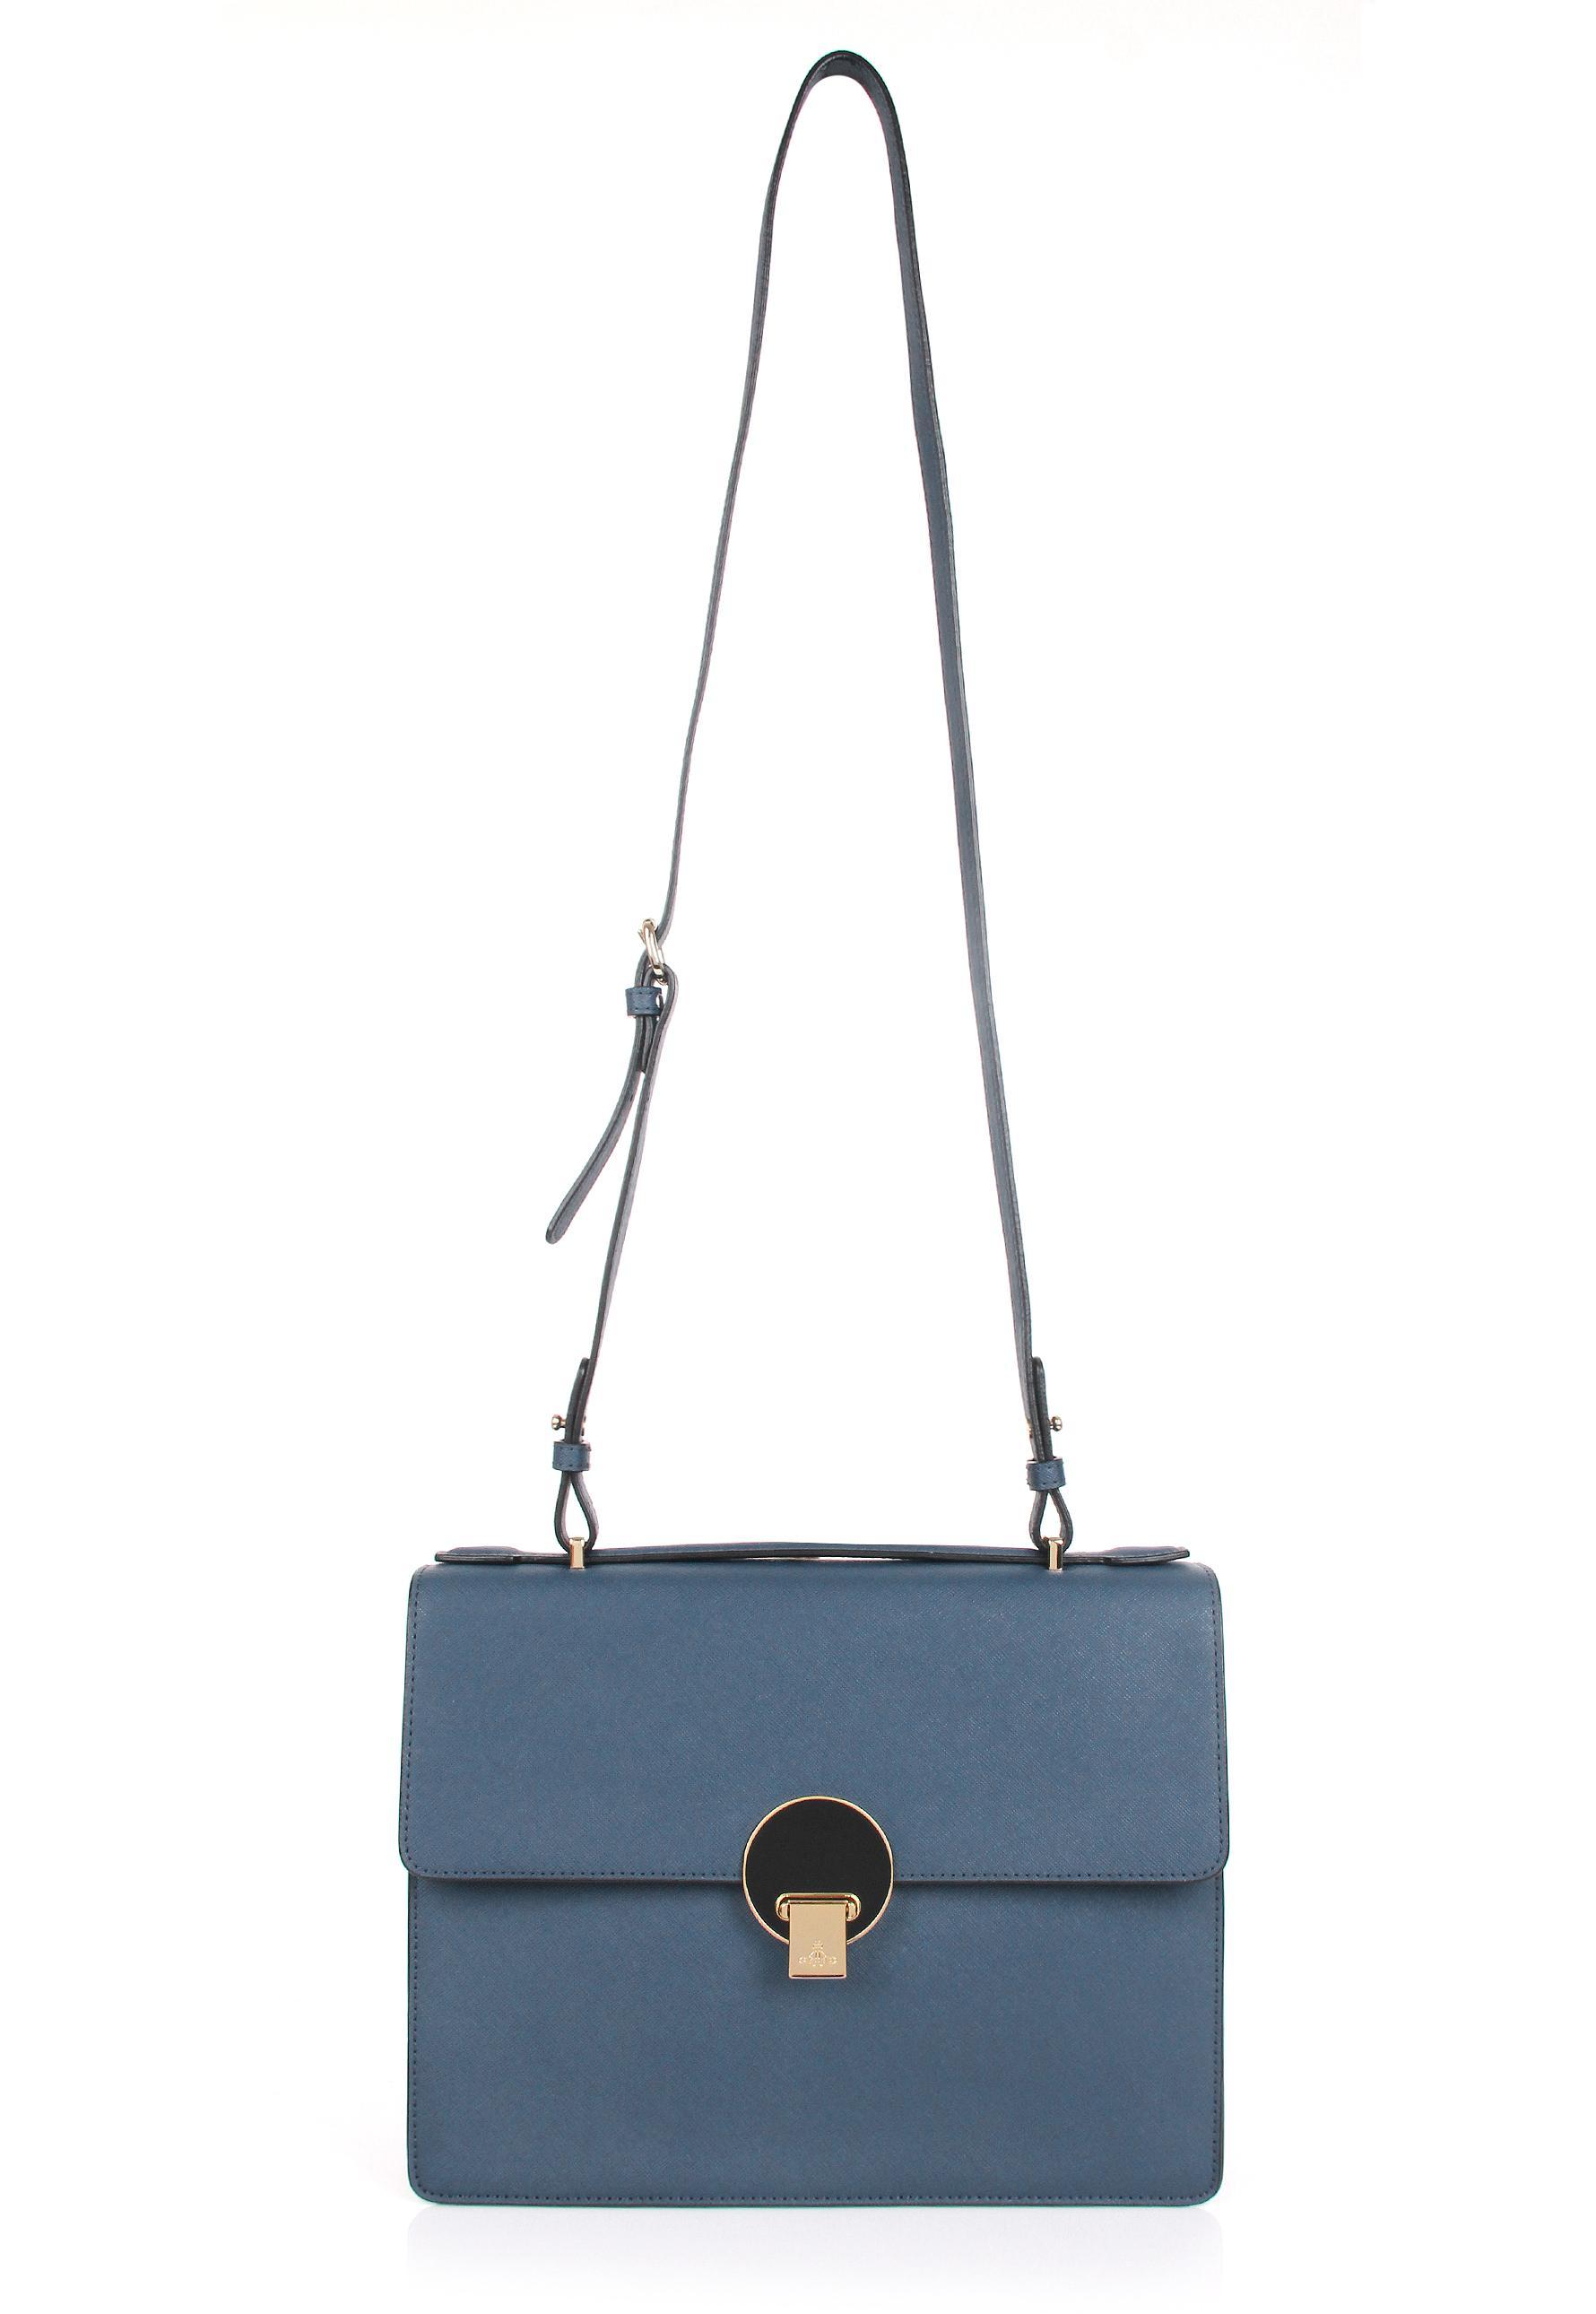 f8e3eff9181 Vivienne Westwood Opio Saffiano 131130 Medium Shoulder Bag Blue in ...